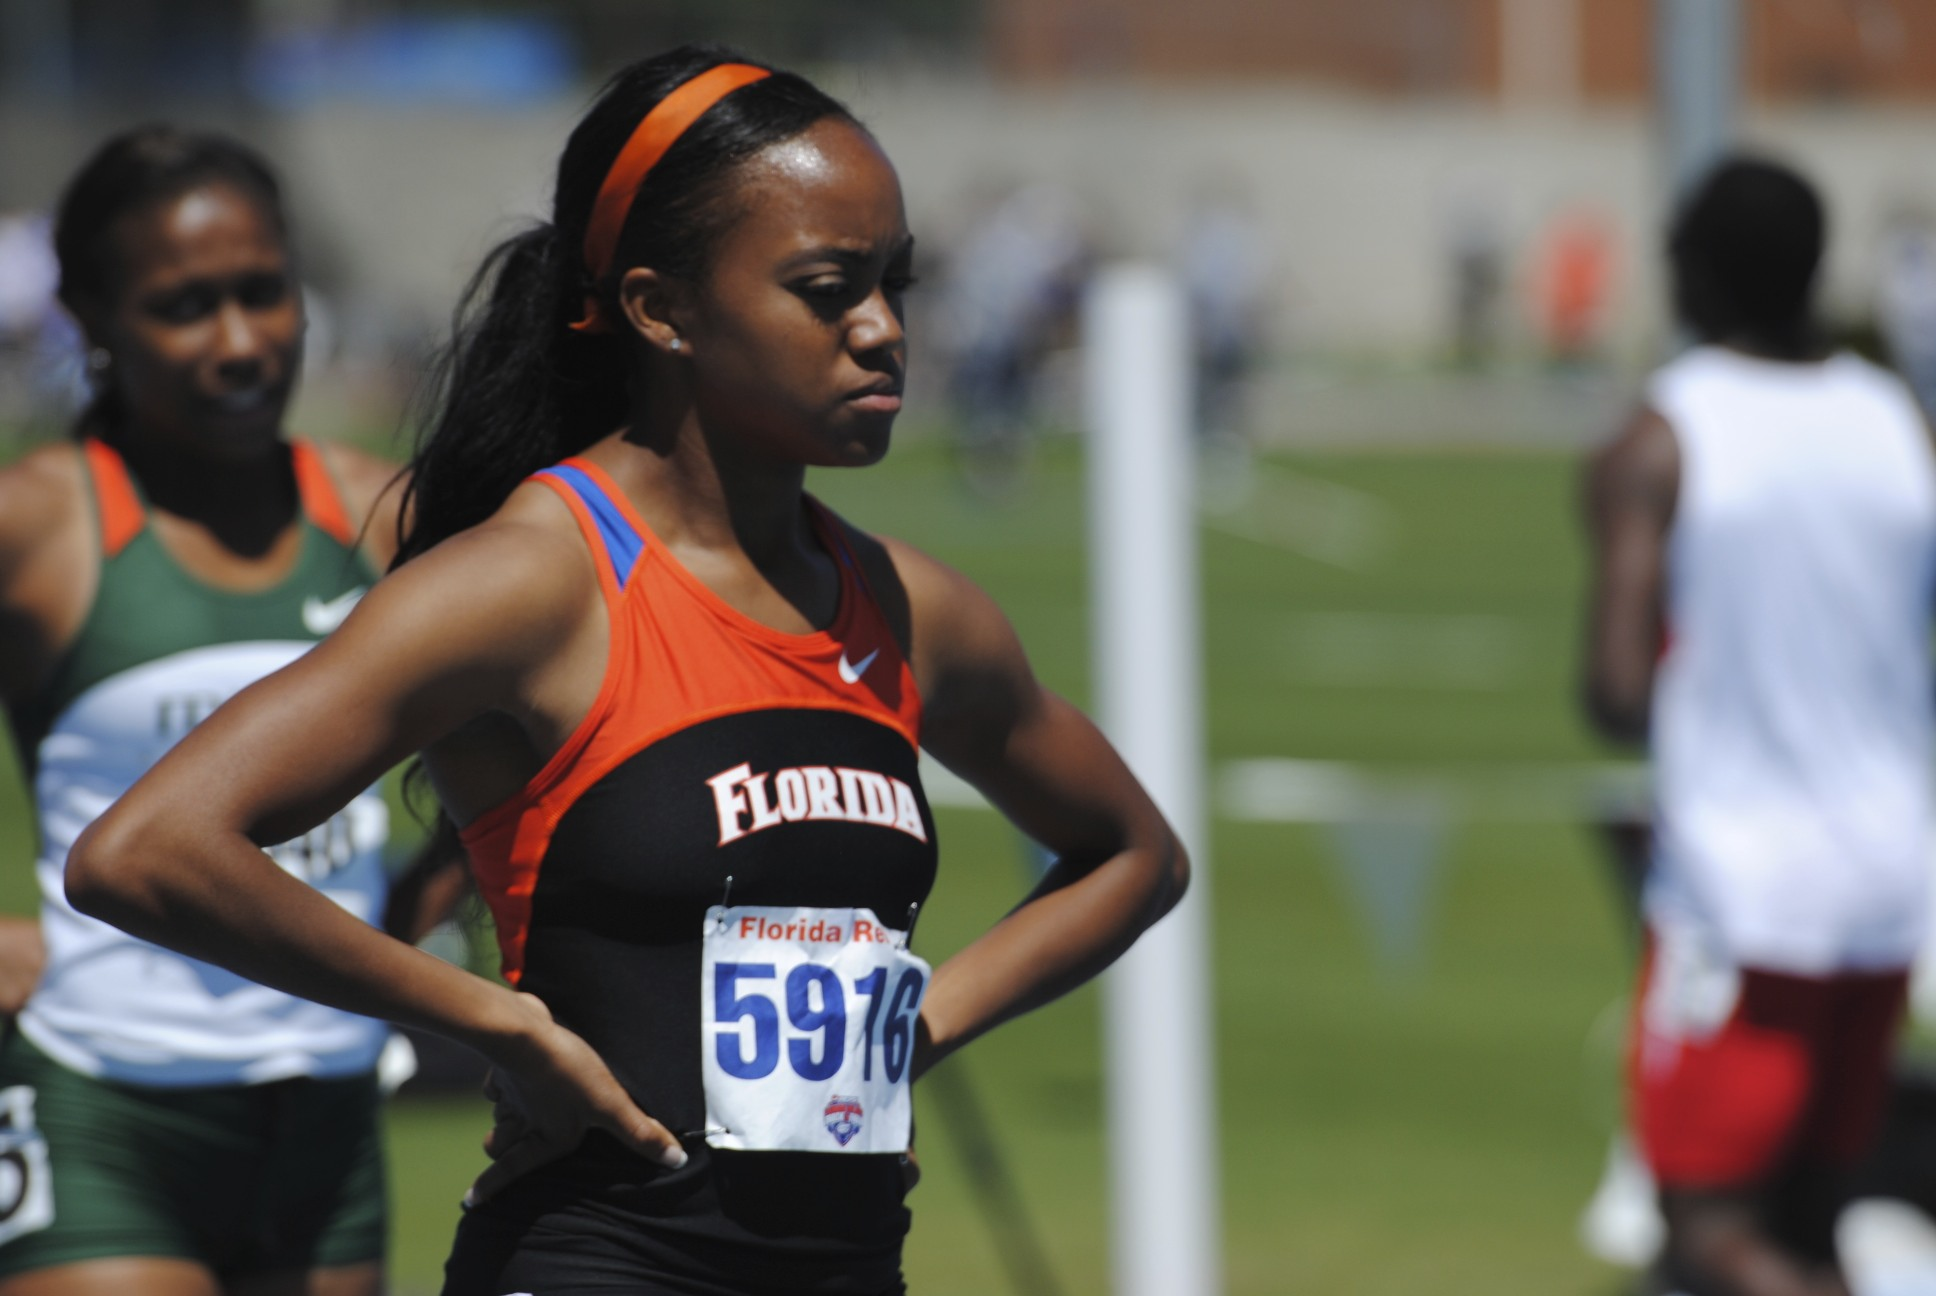 Junior Michelle Stegal finishes the 400 meter dash.